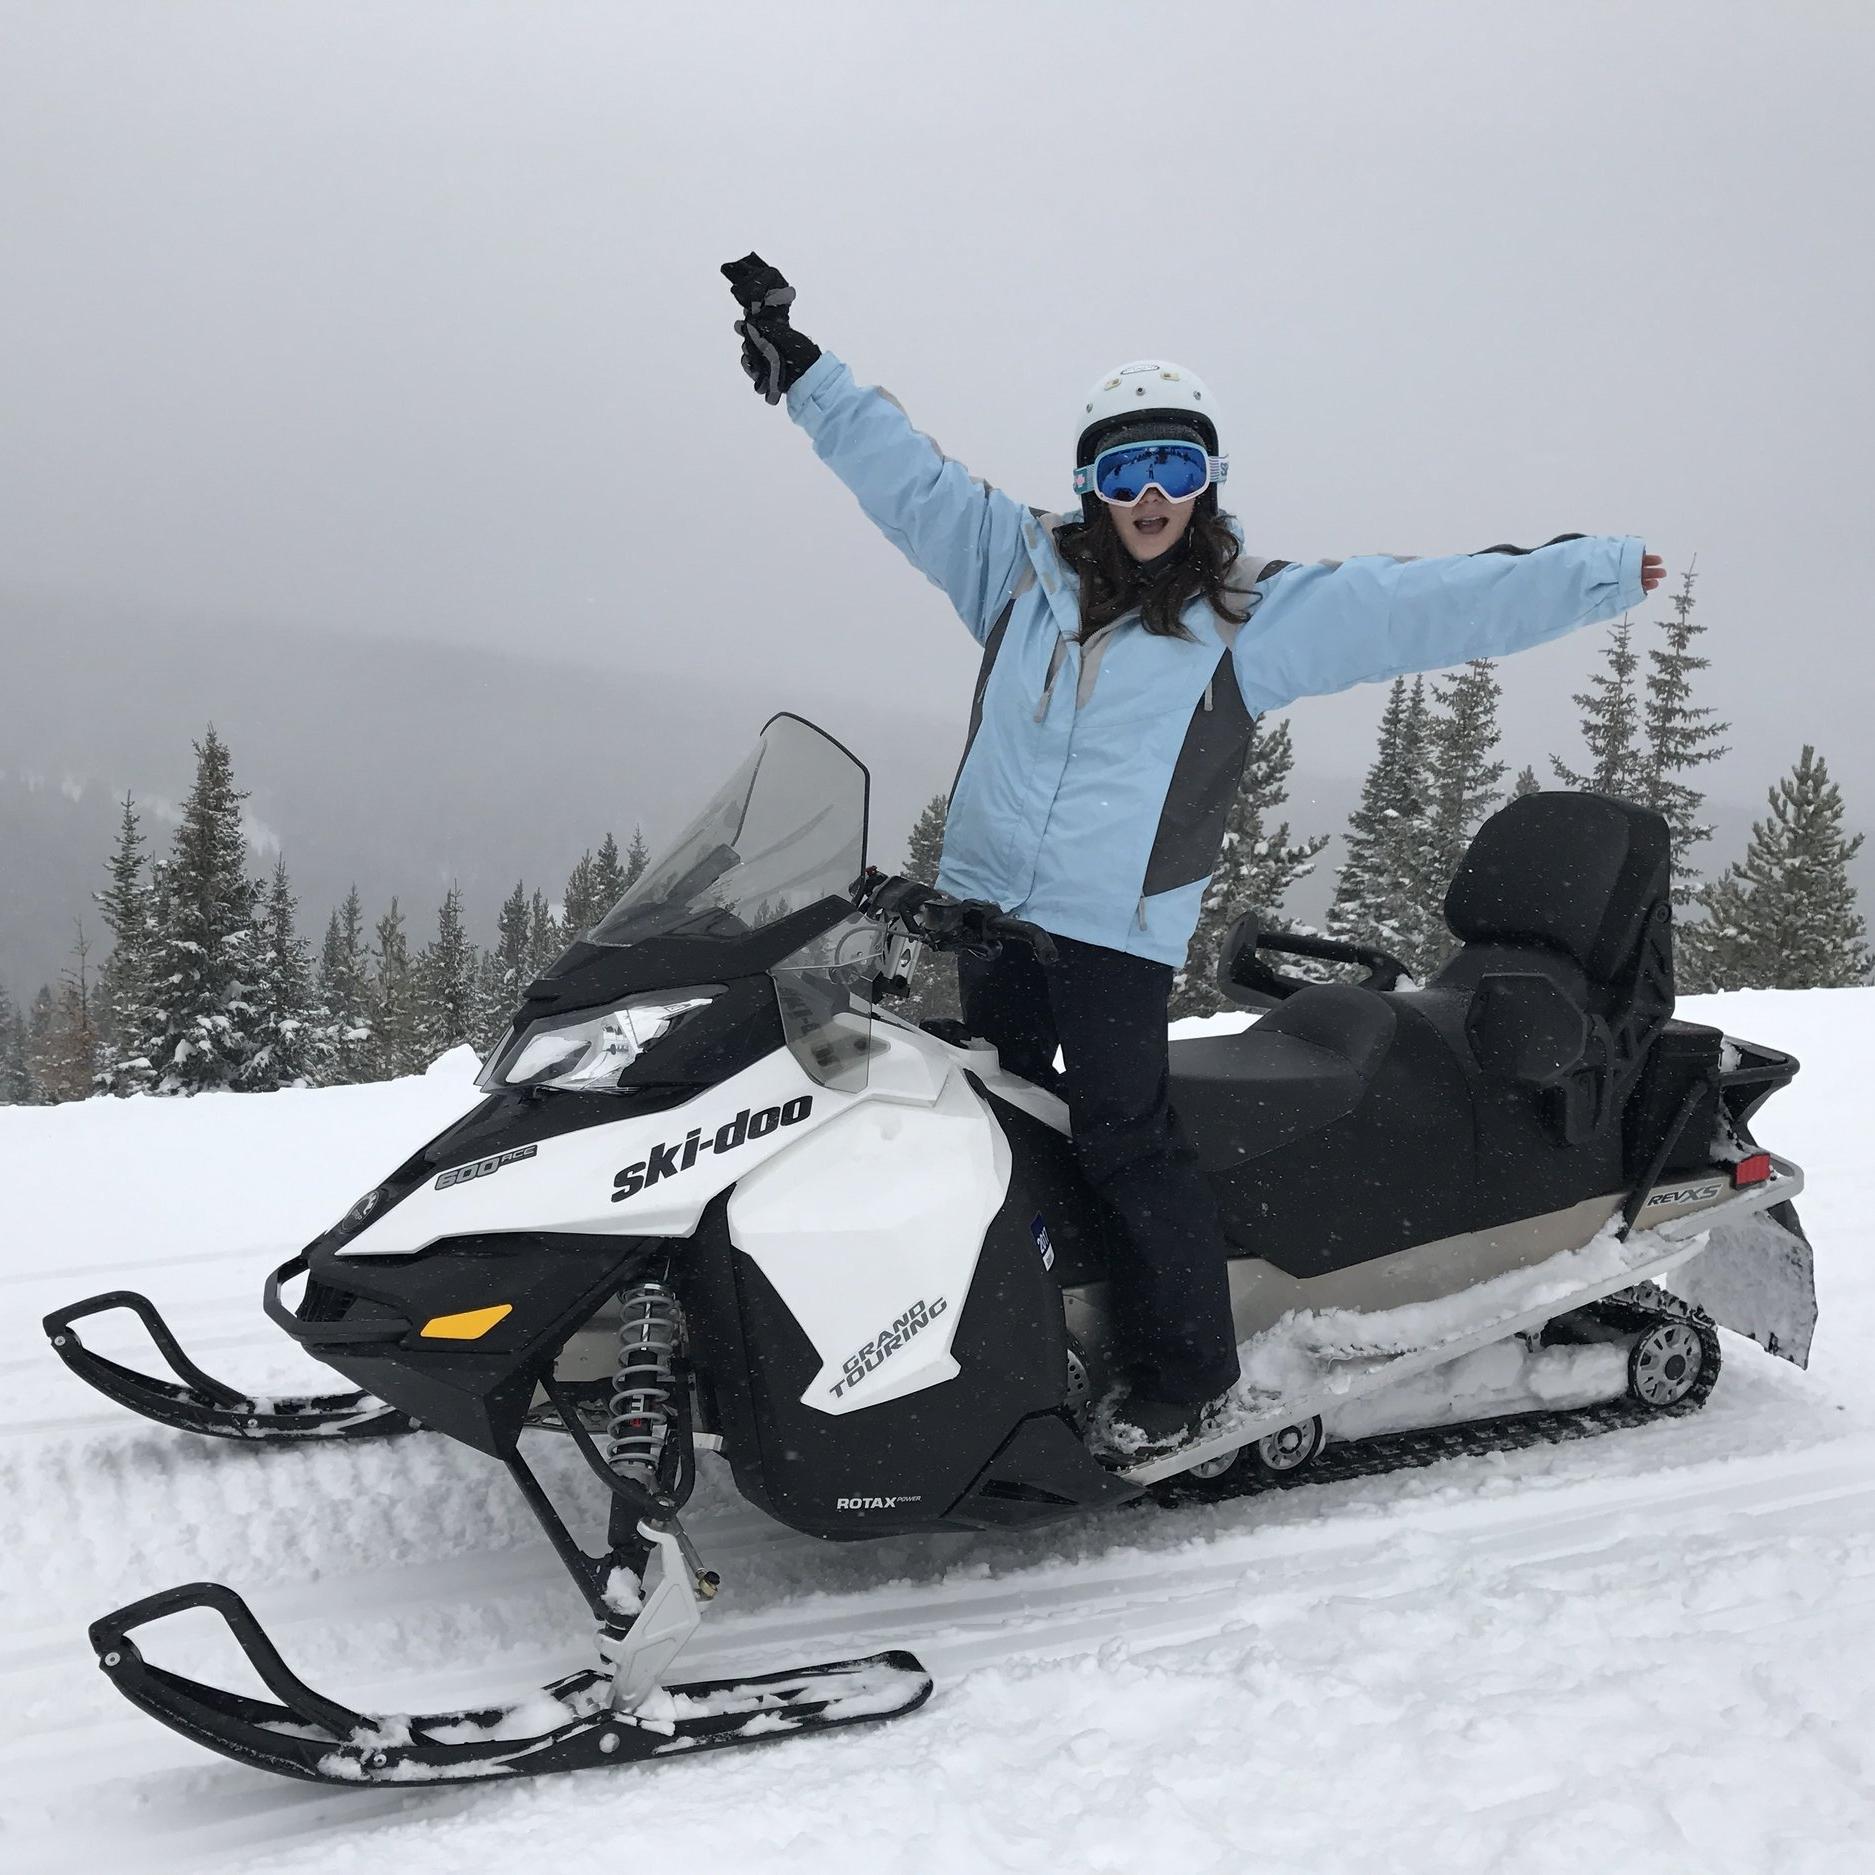 skiing_inadequate.jpg